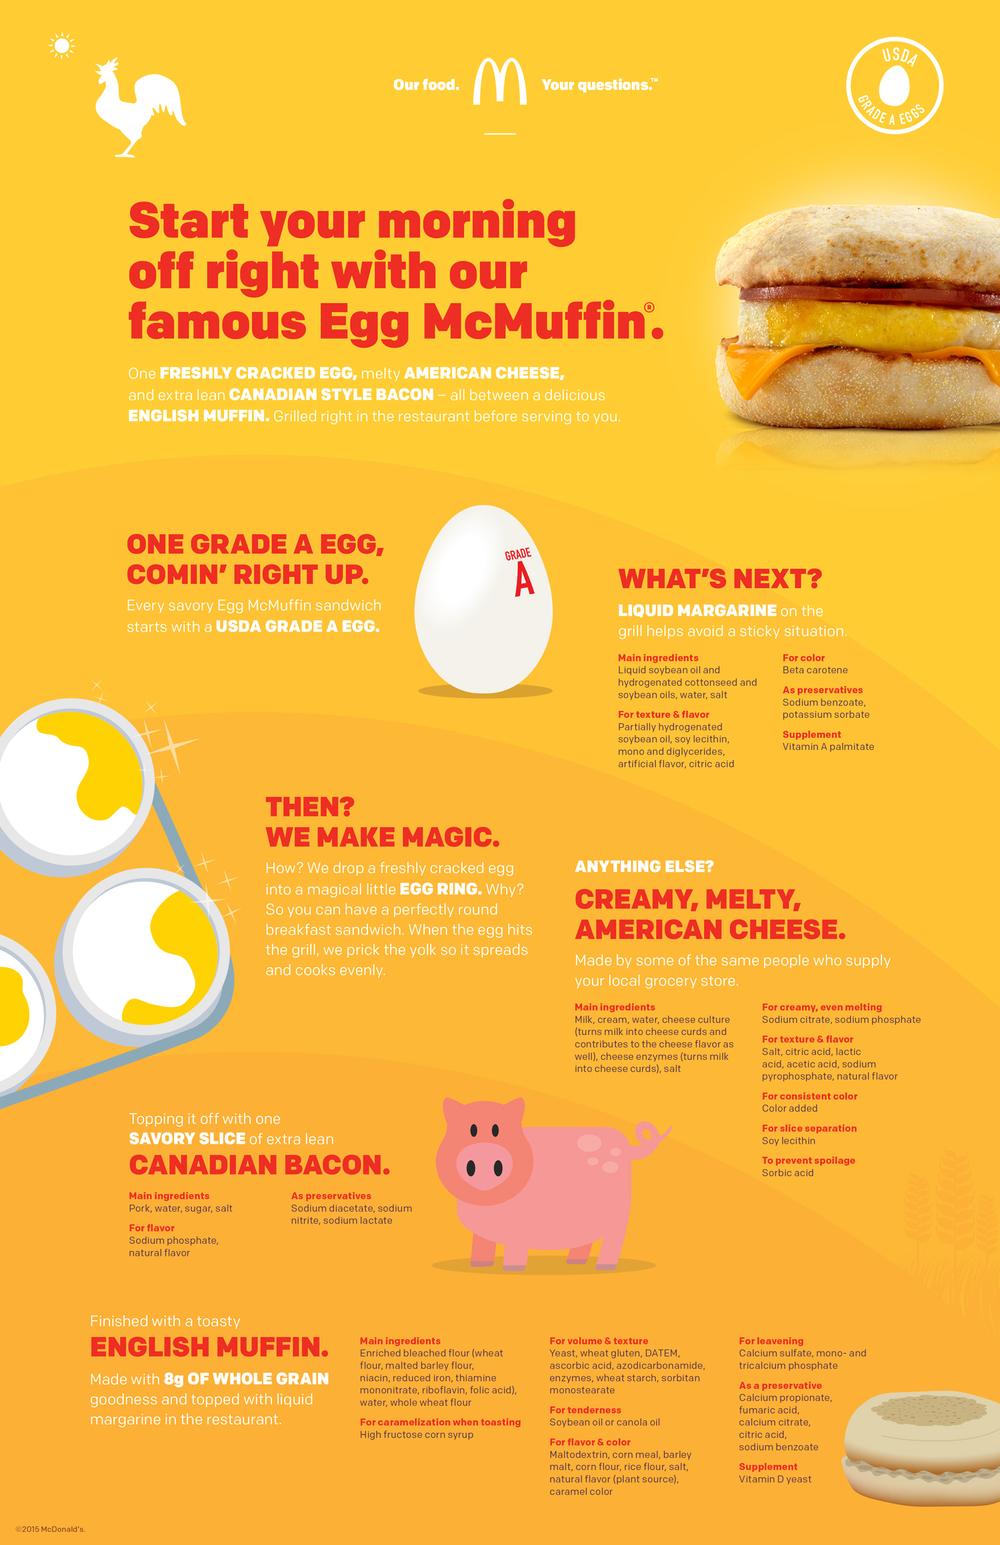 McD_FAQ_EggMcMuffin_012015_300dpi.jpg